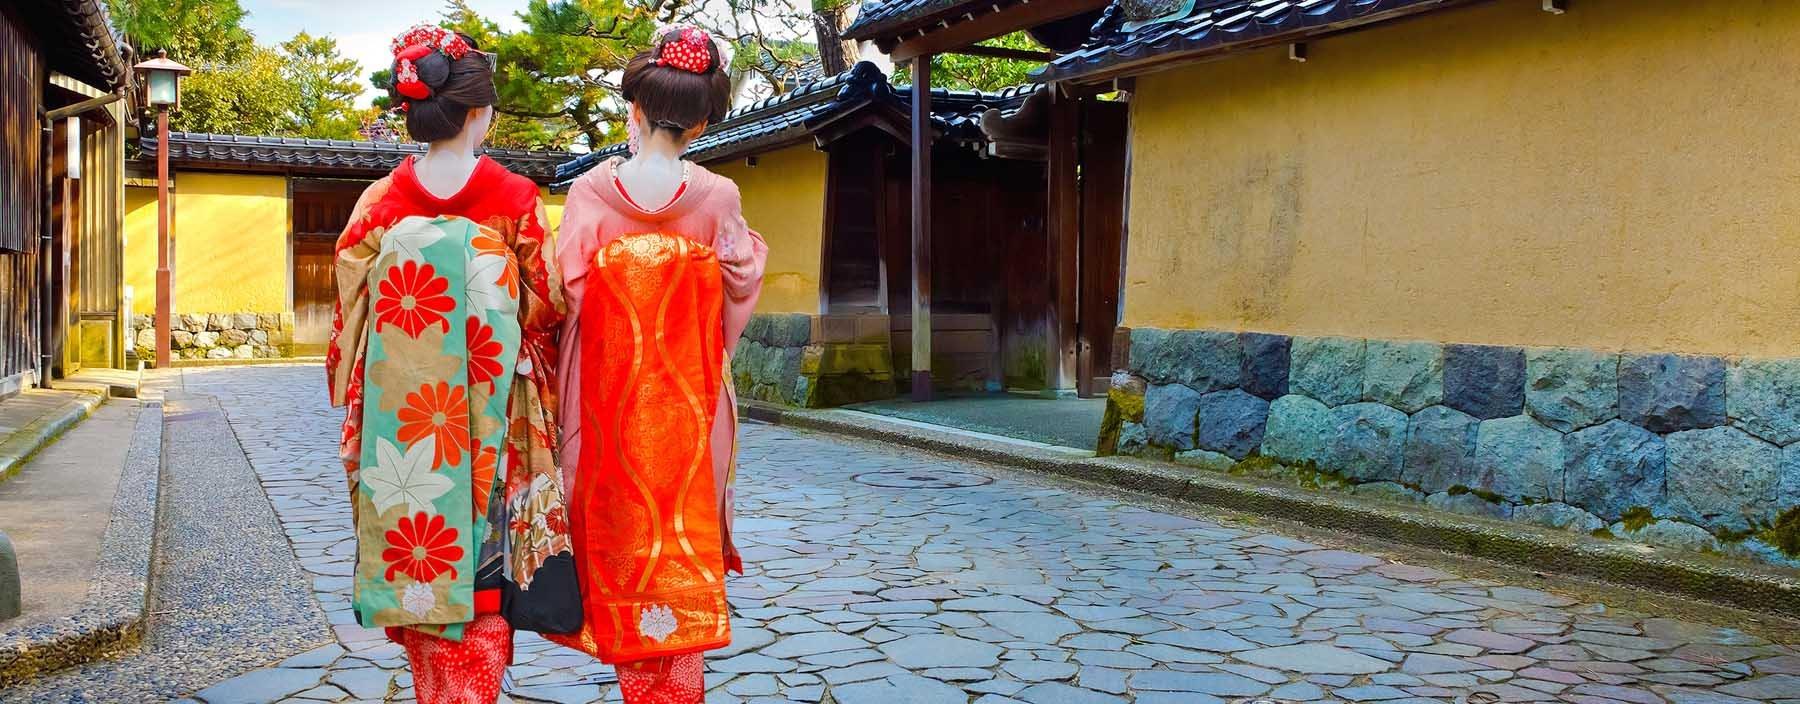 jp, kanazawa, geisha at nagamachi samurai street.jpg